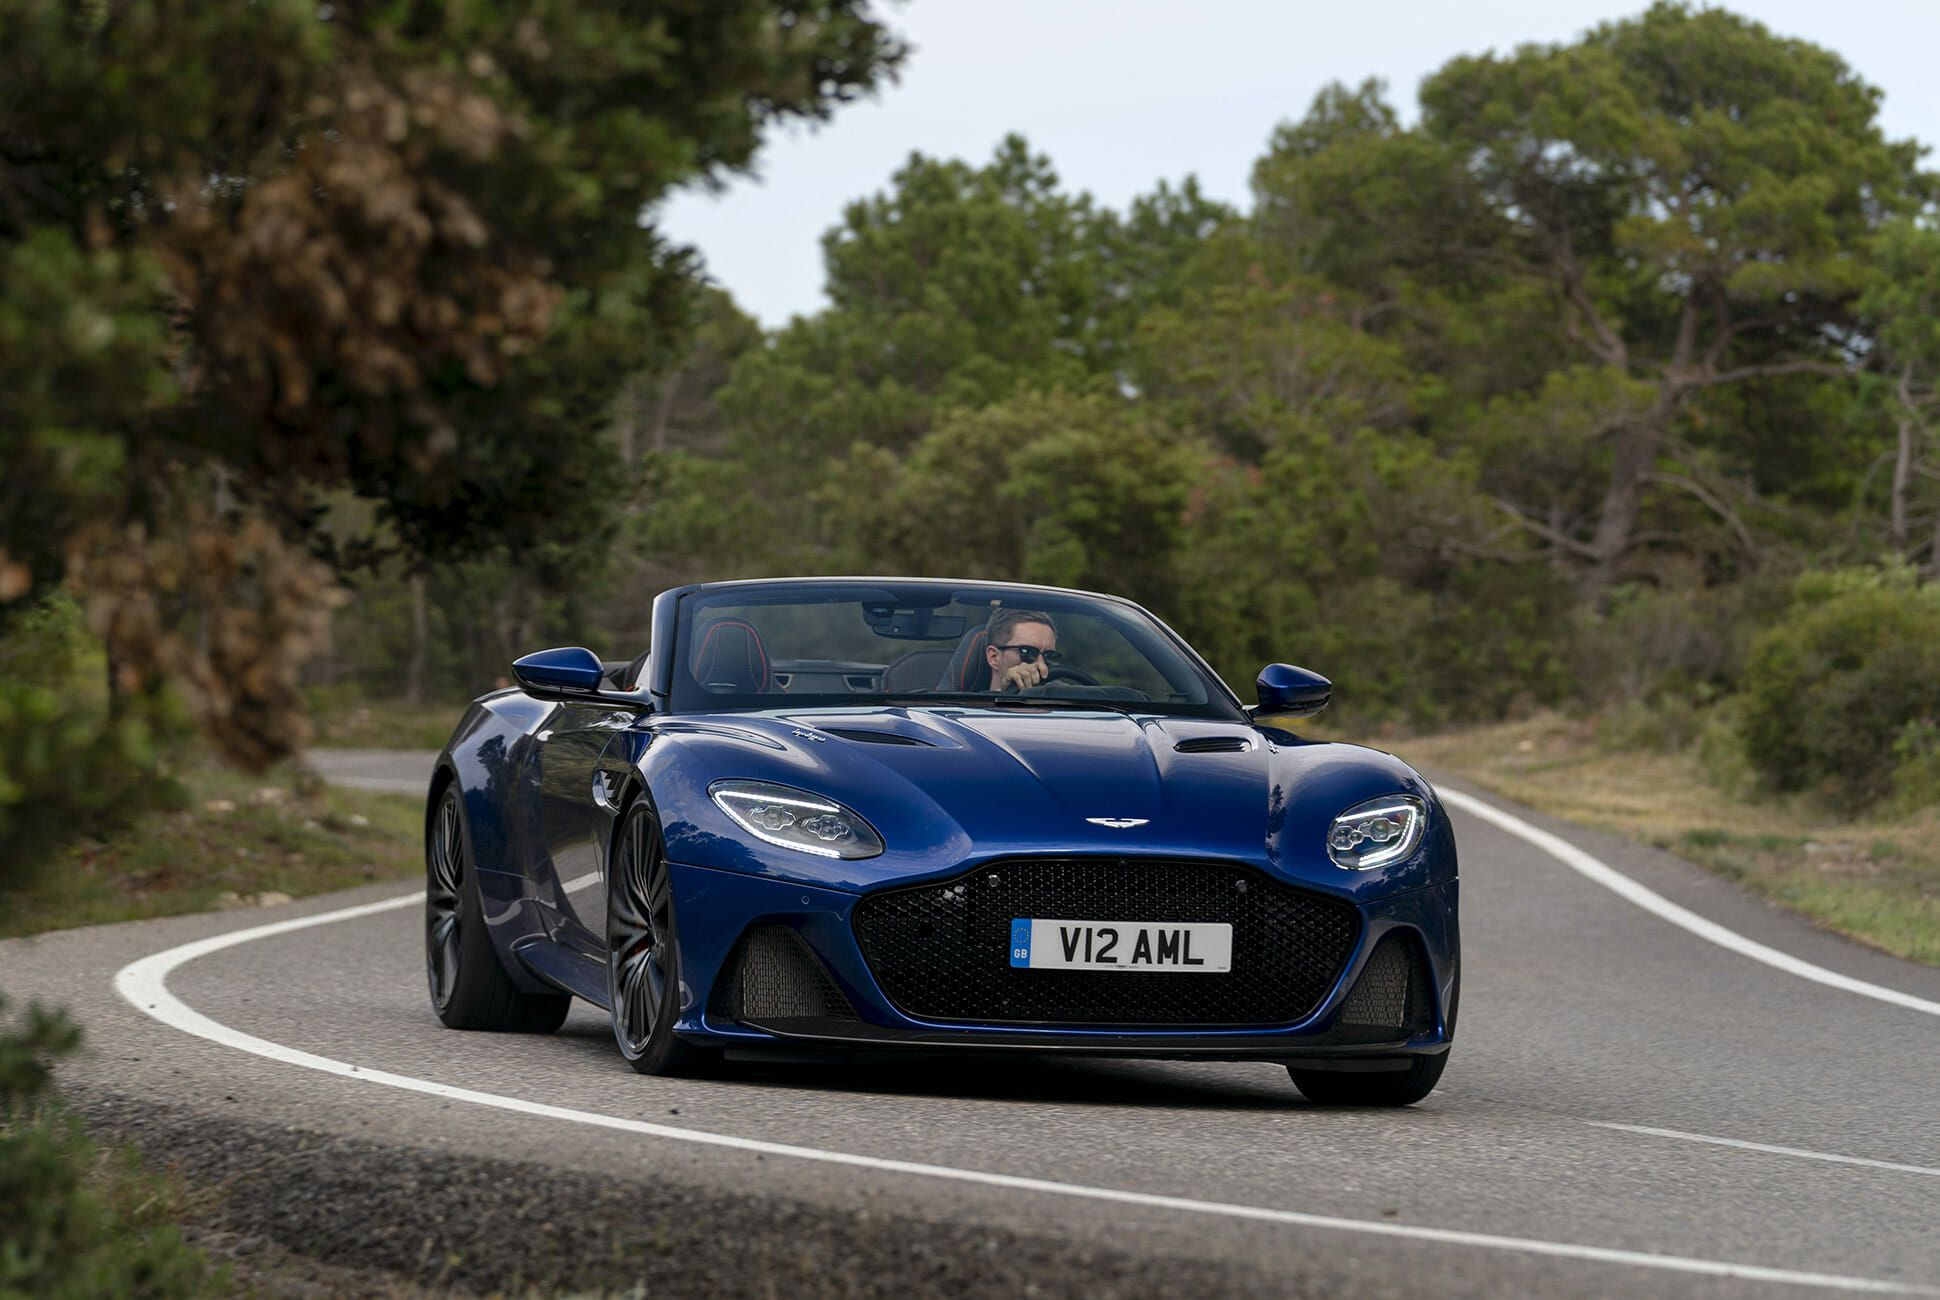 Aston-Martin-DBS-Superleggera-Volante-Review-gear-patrol-slide-4